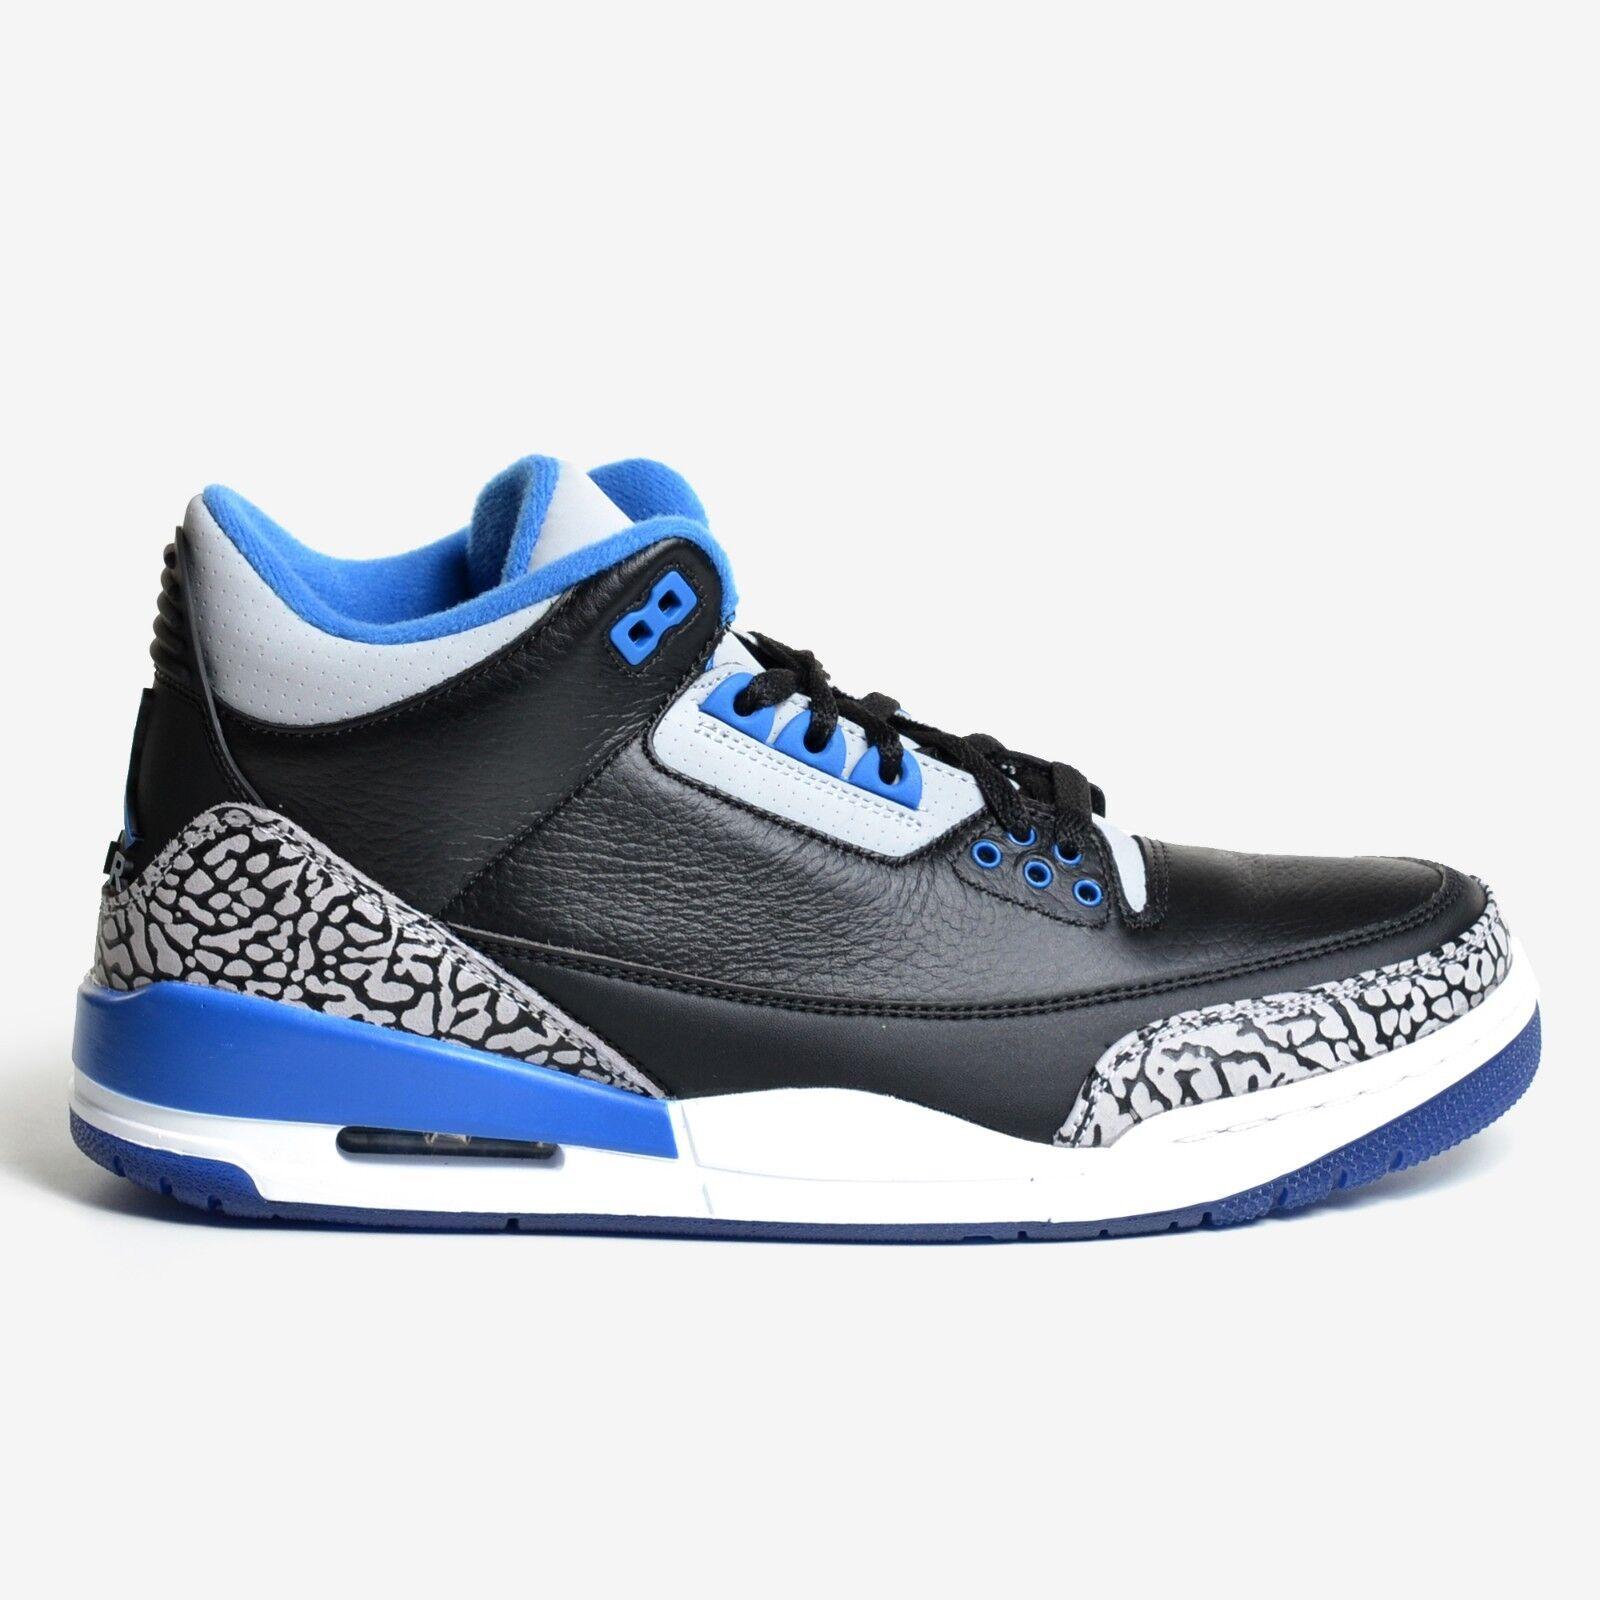 brand new 2a2ff b2212 Air Jordan 3 Retro Black Sport Blue 2014 Grey White Men s III DS 136064-007